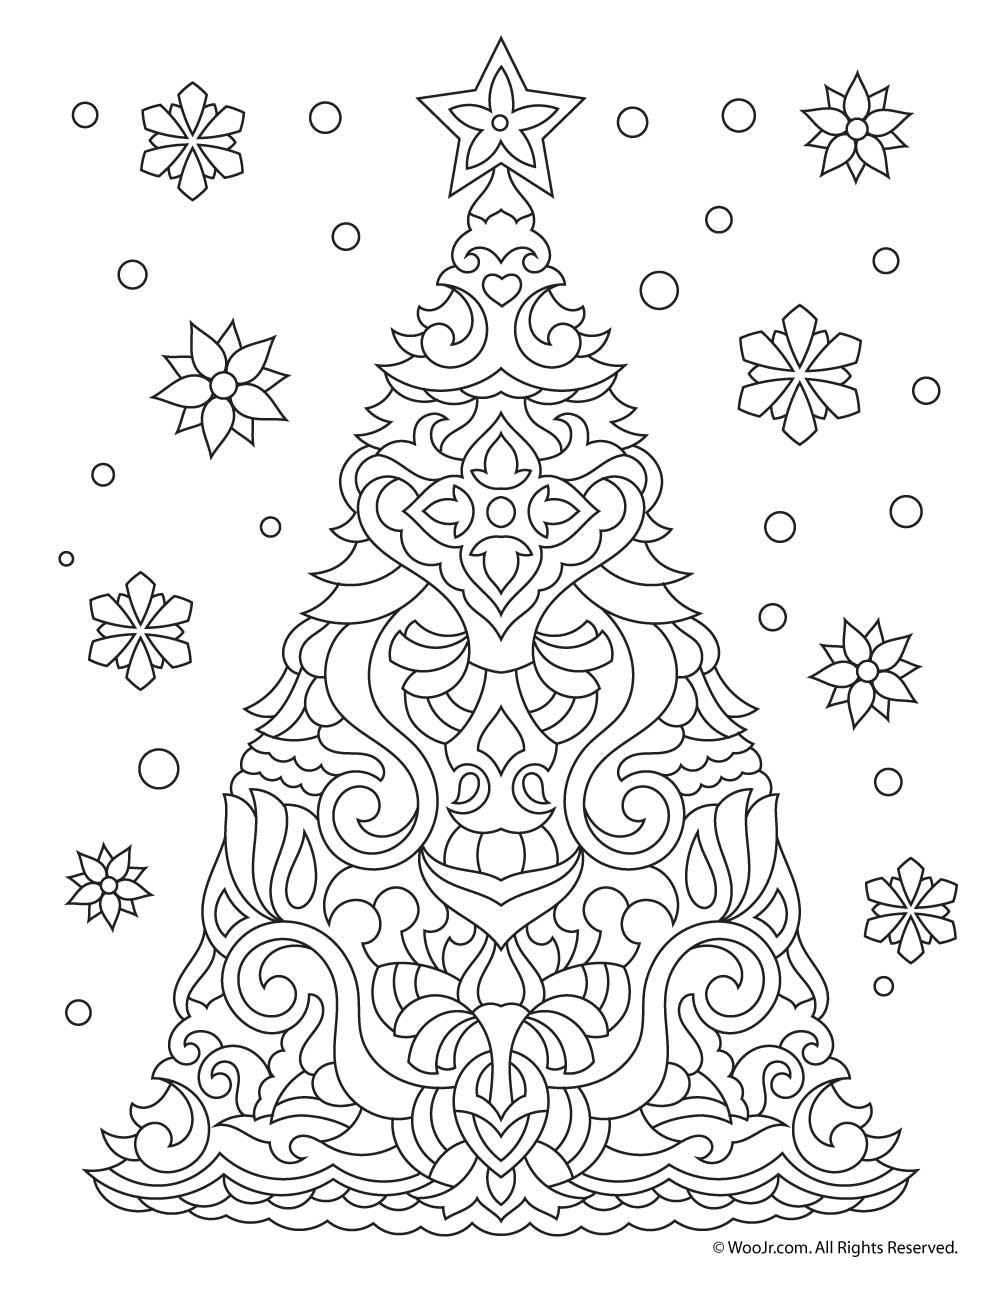 Christmas Tree Adult Coloring Page | Woo! Jr. Kids Activities | christmas tree coloring pages for adults